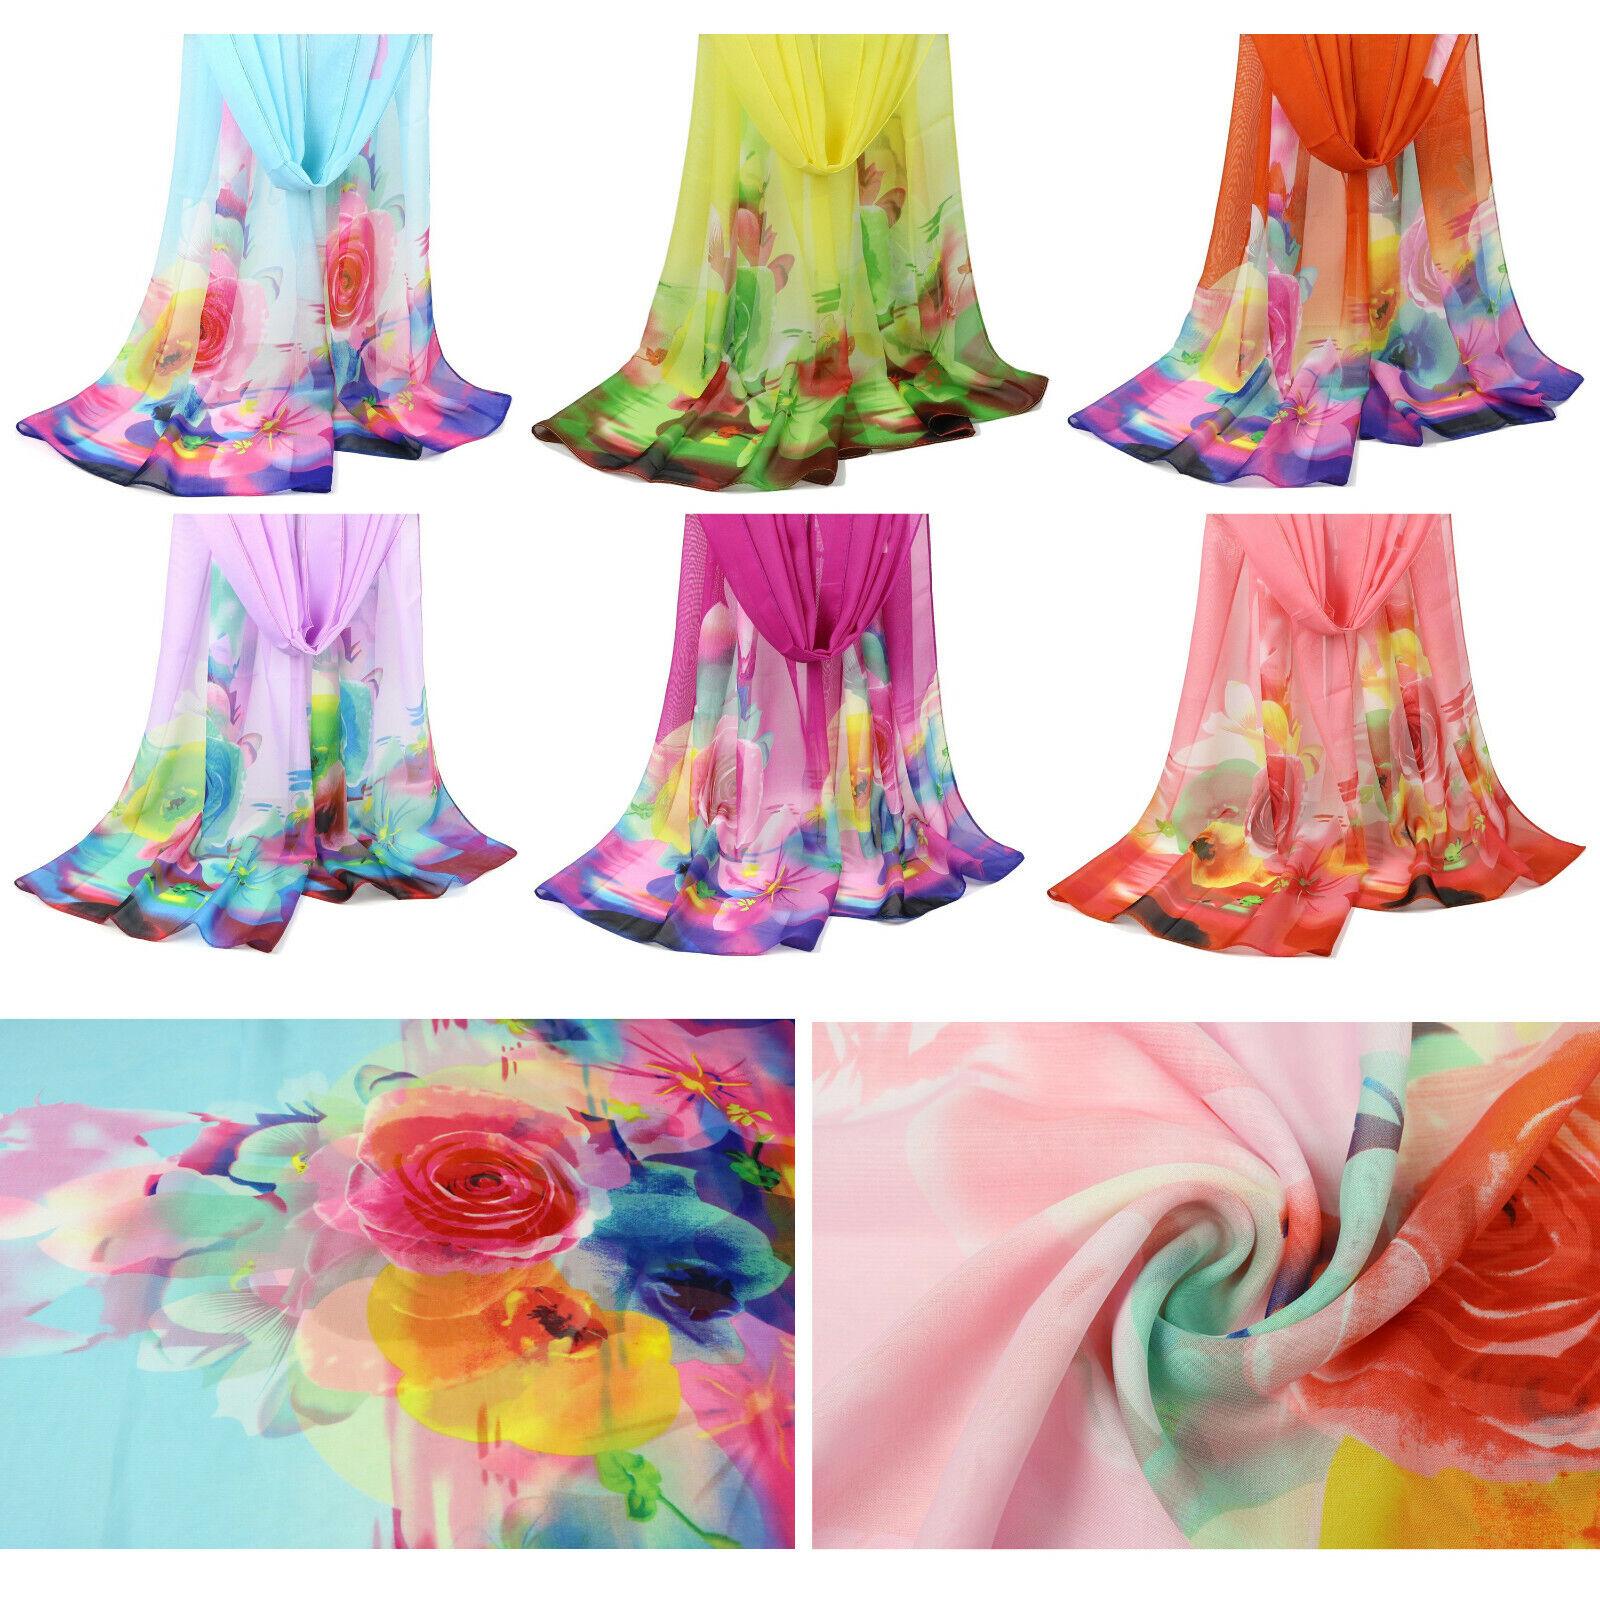 Women's Rose Flower Natural Dye Chiffon Lightweight Beach Wrap Fashion Scarf Clothing, Shoes & Accessories